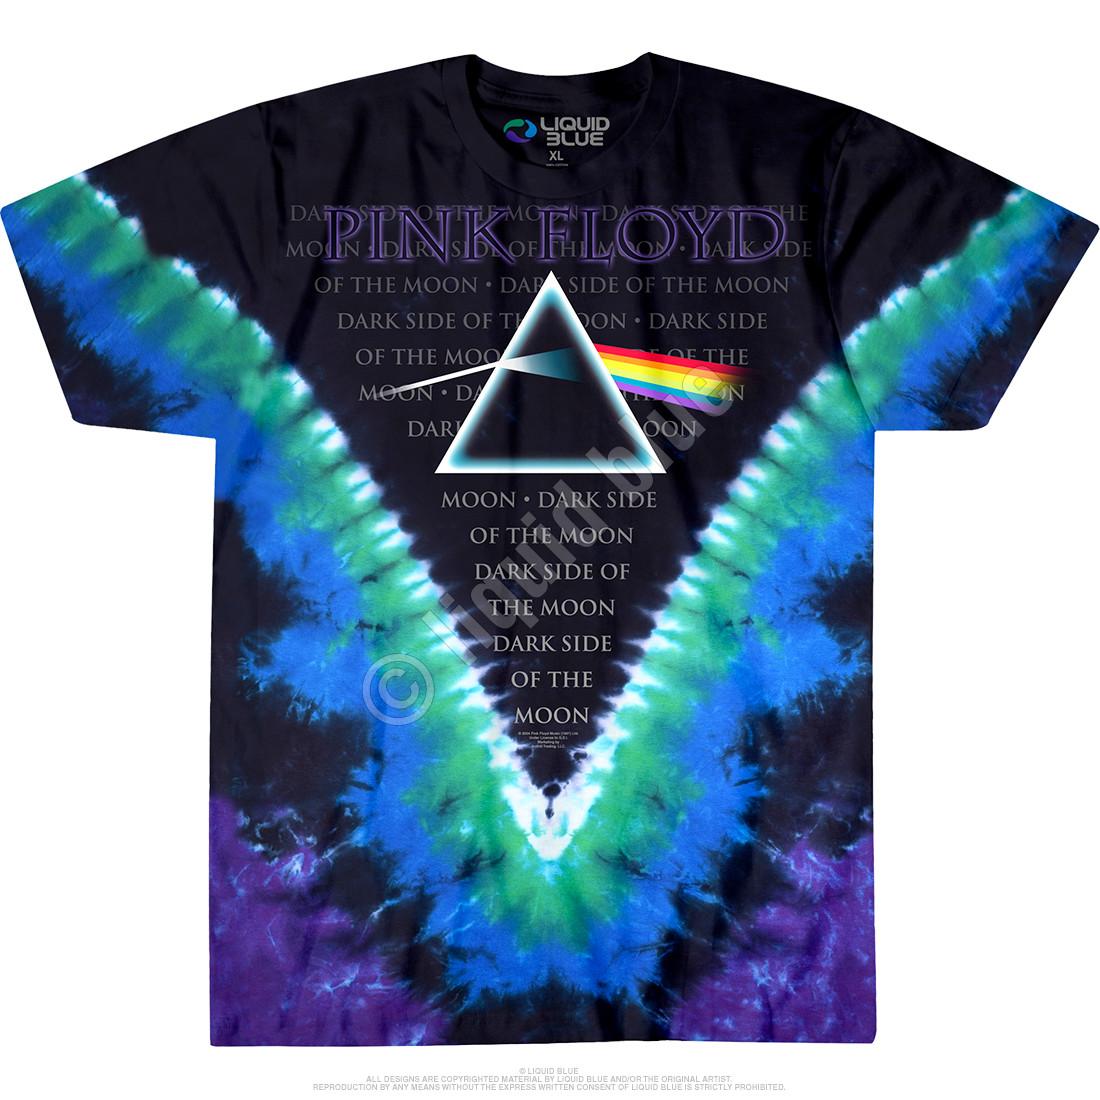 PINK FLOYD t-shirt BLACK mod:DARK SIDE 2 clothing kid T-shirt for children